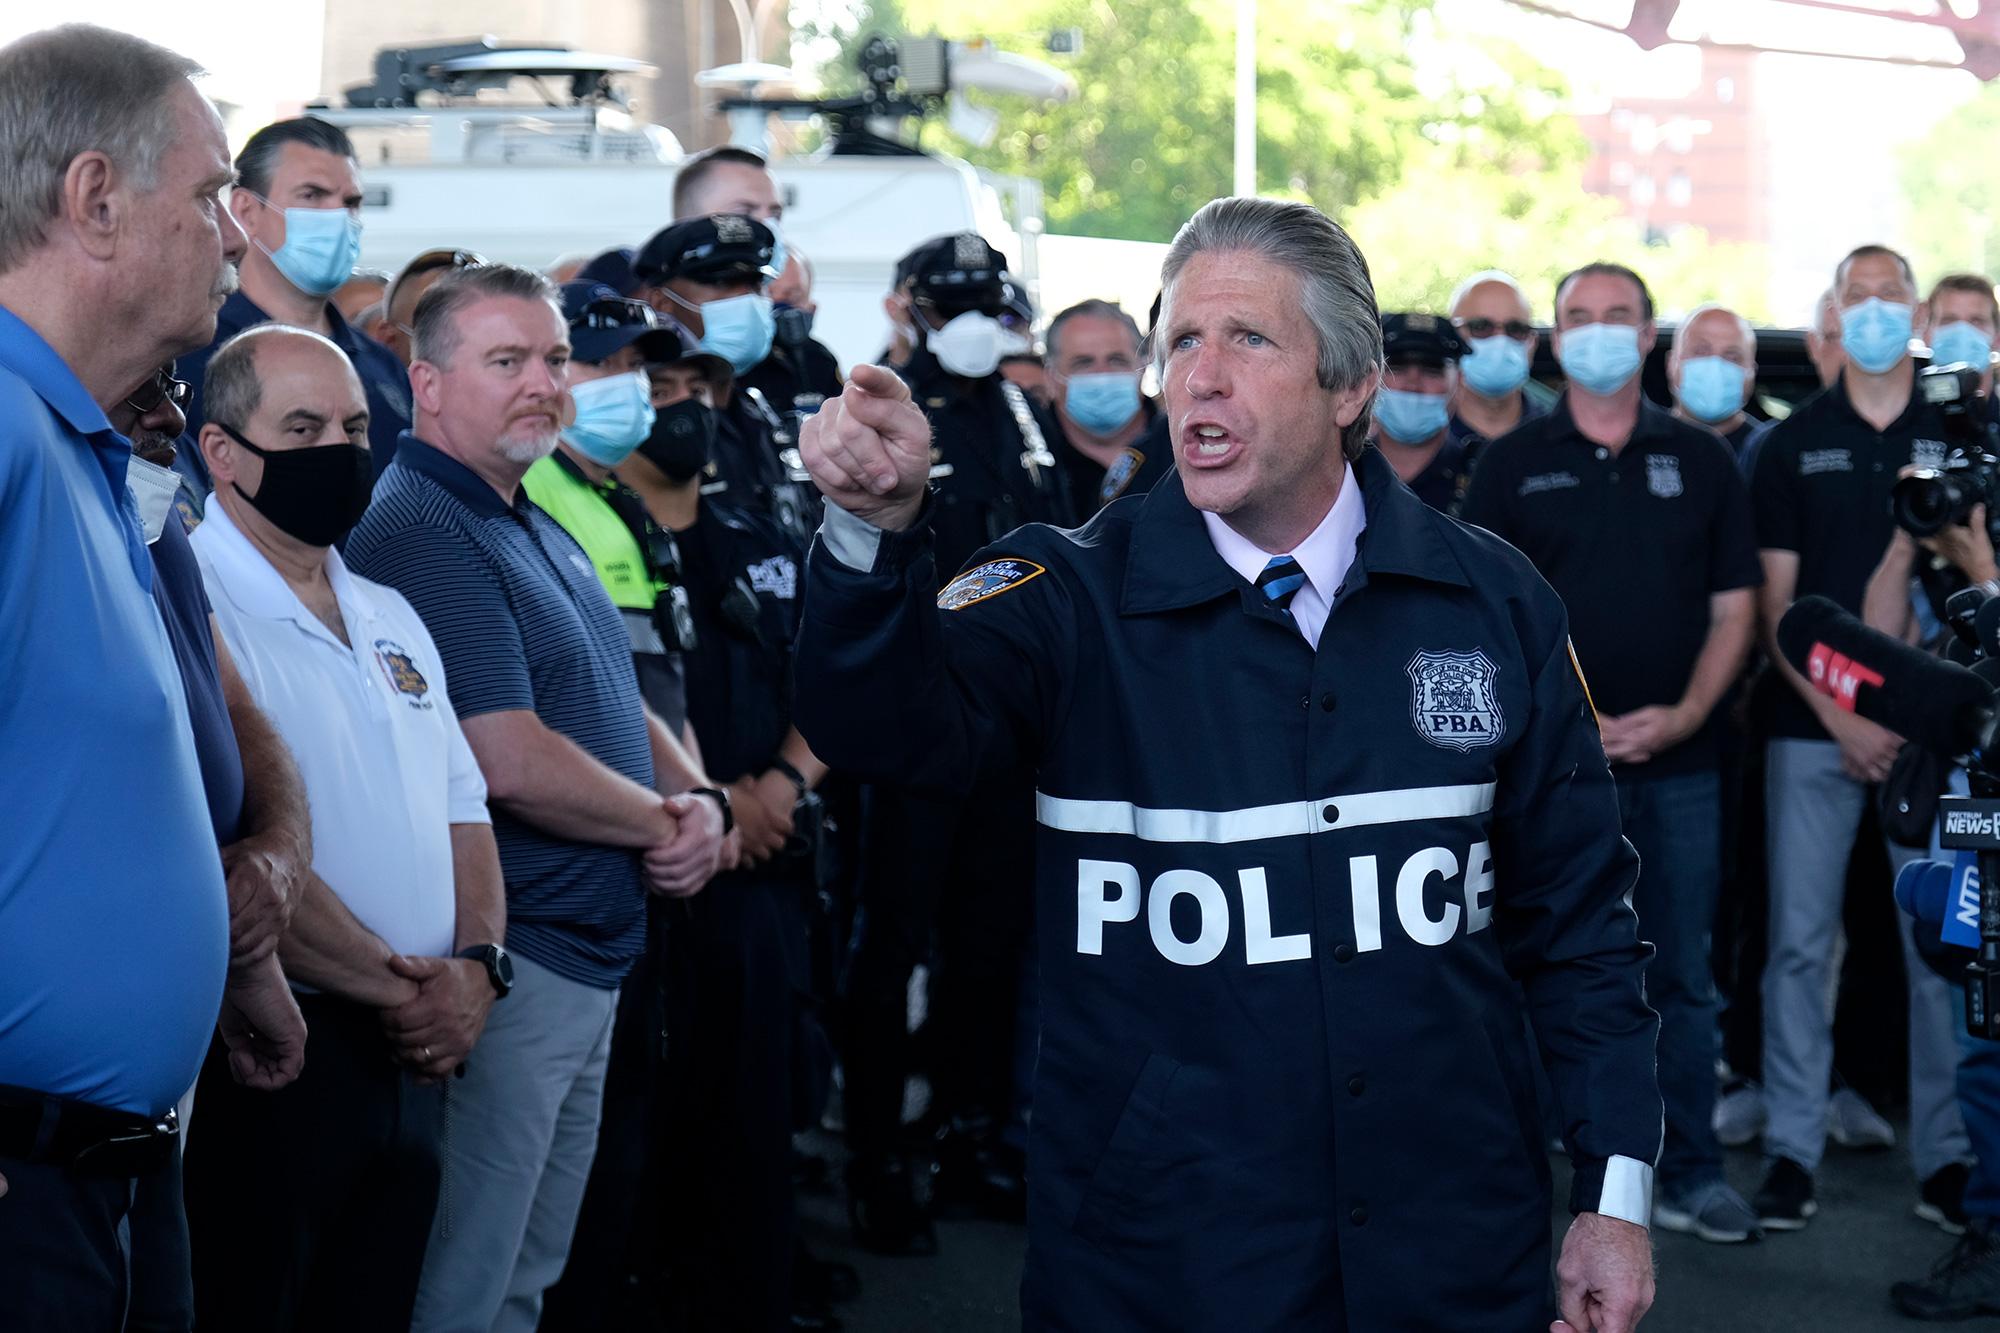 NYPD union endorses Trump, nicknames Joe Biden 'Sleepy Joe'